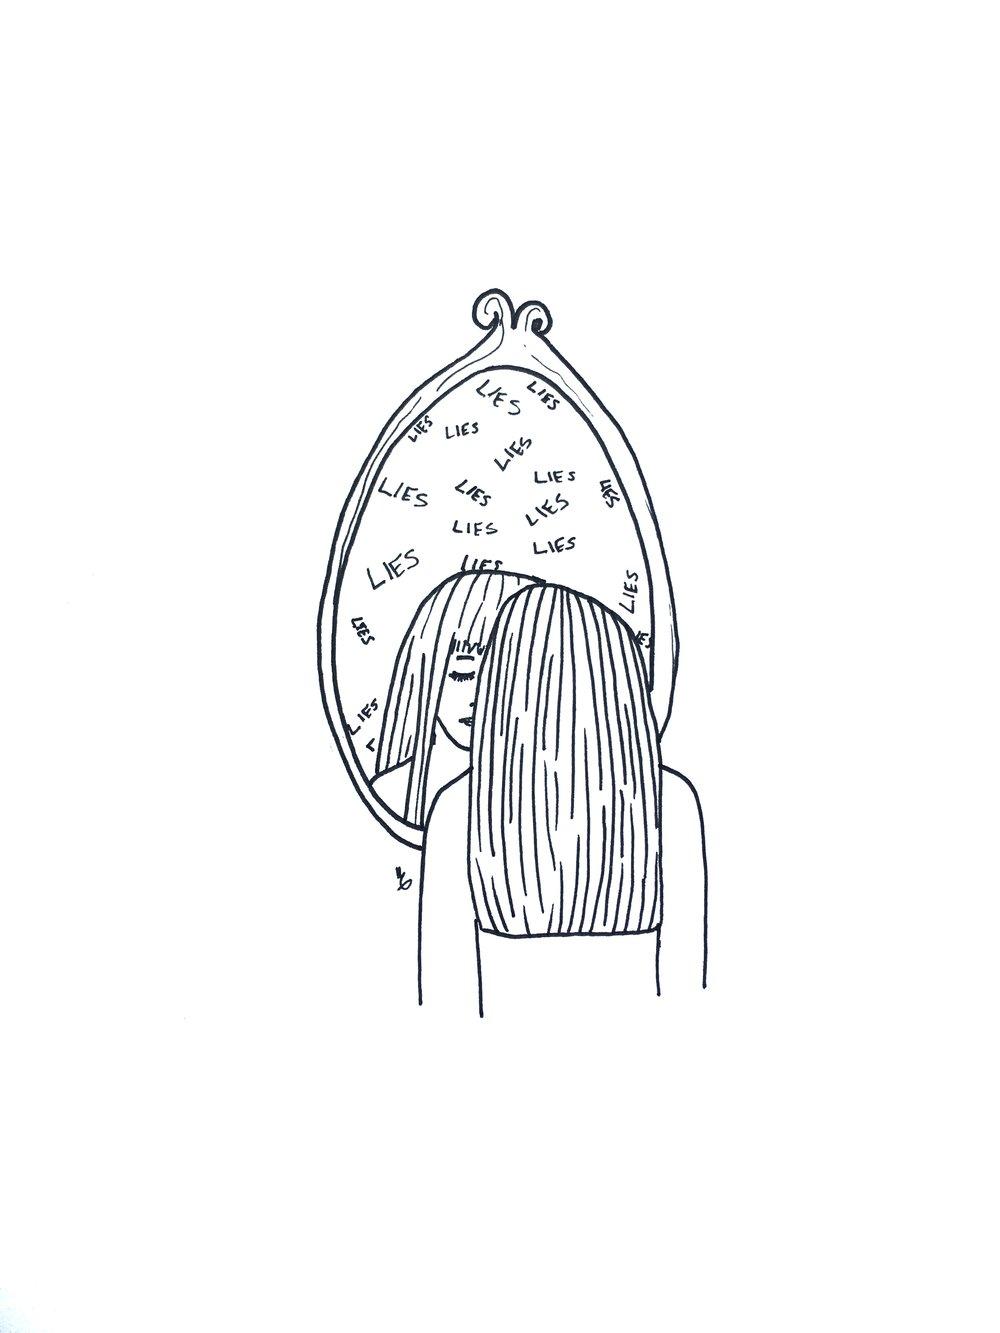 Mirror Lies